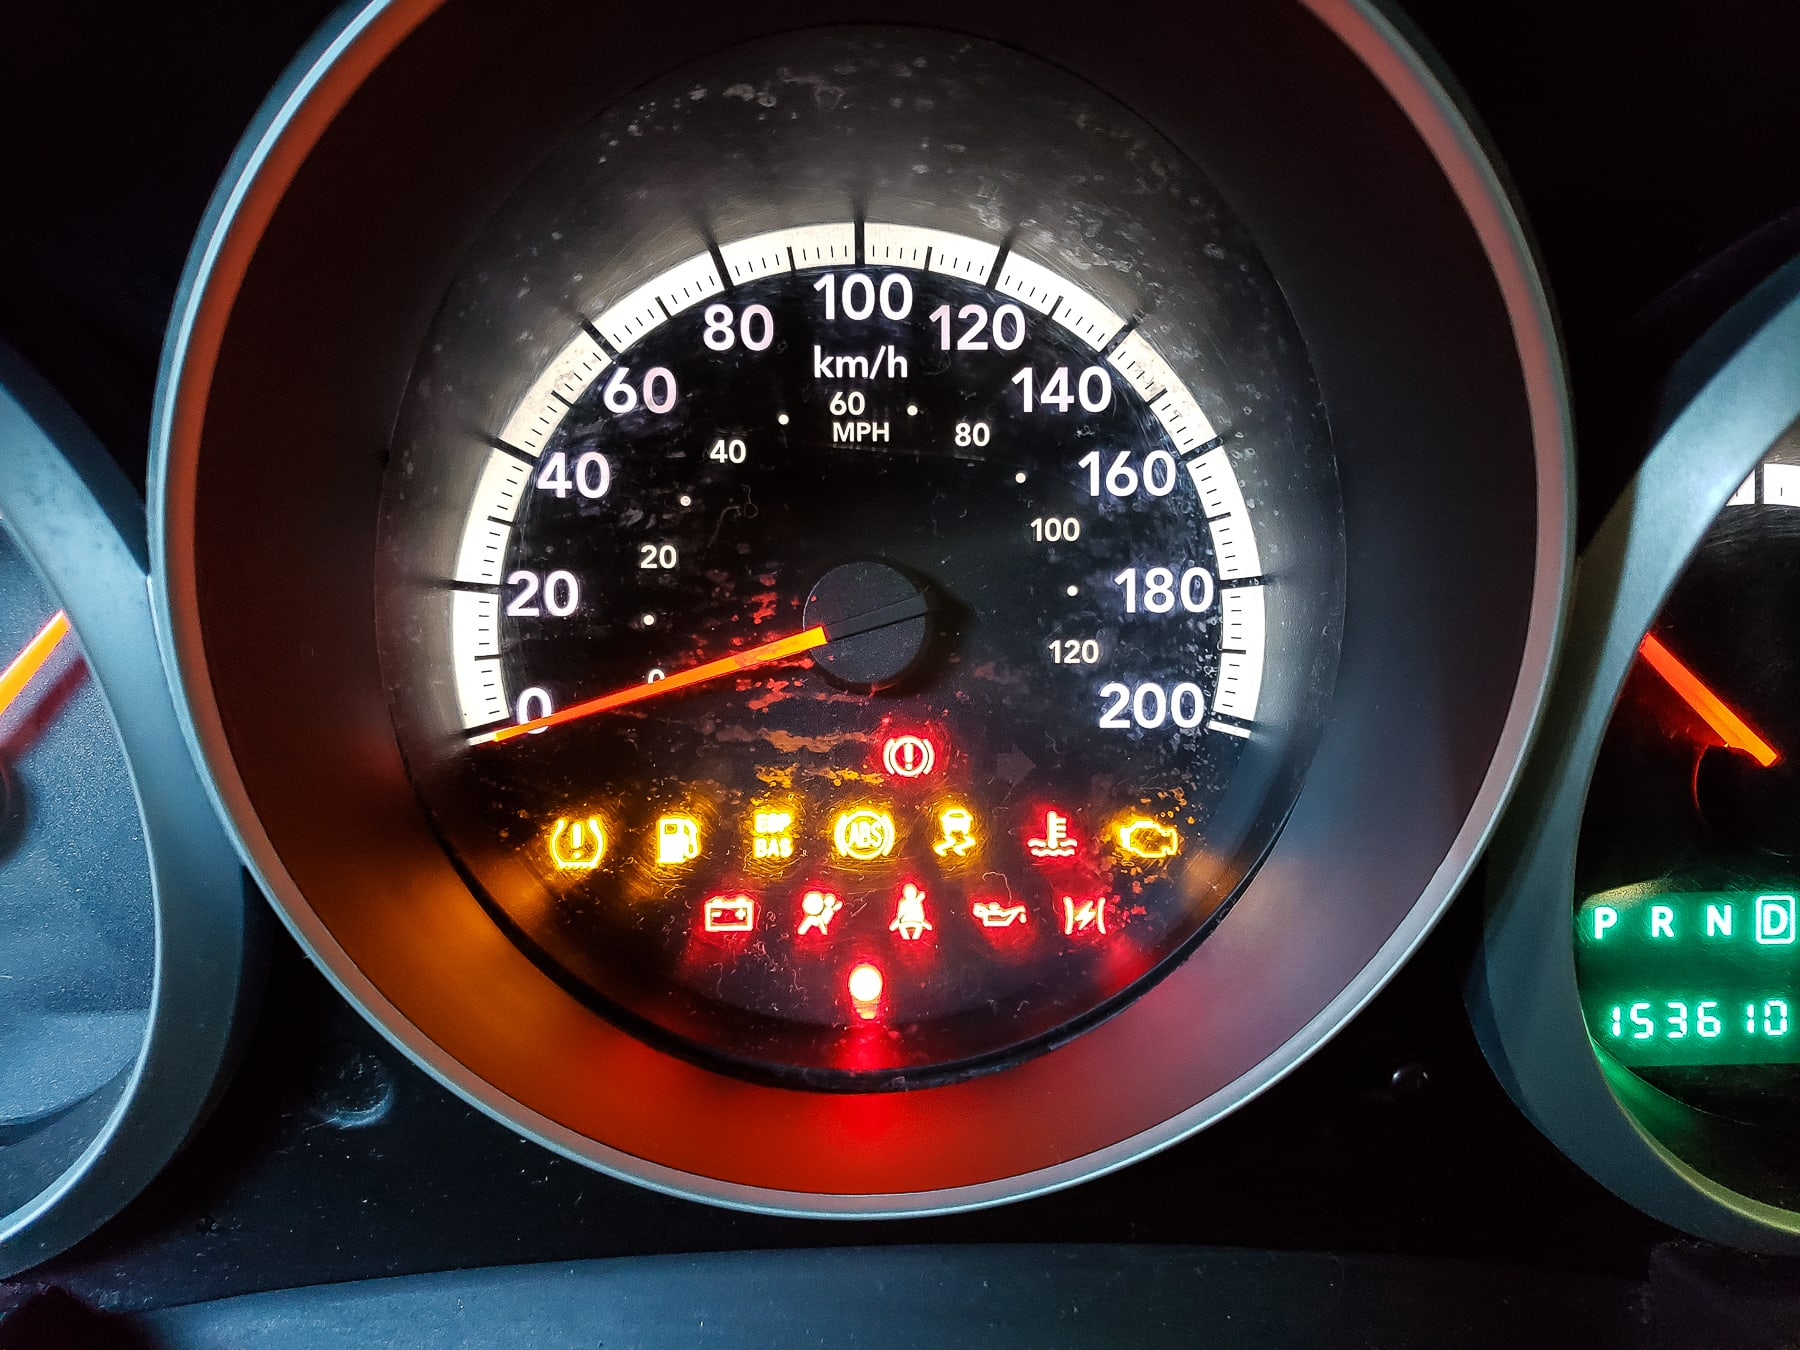 2008 Dodge Grand Caravan, Dash Lights Explained